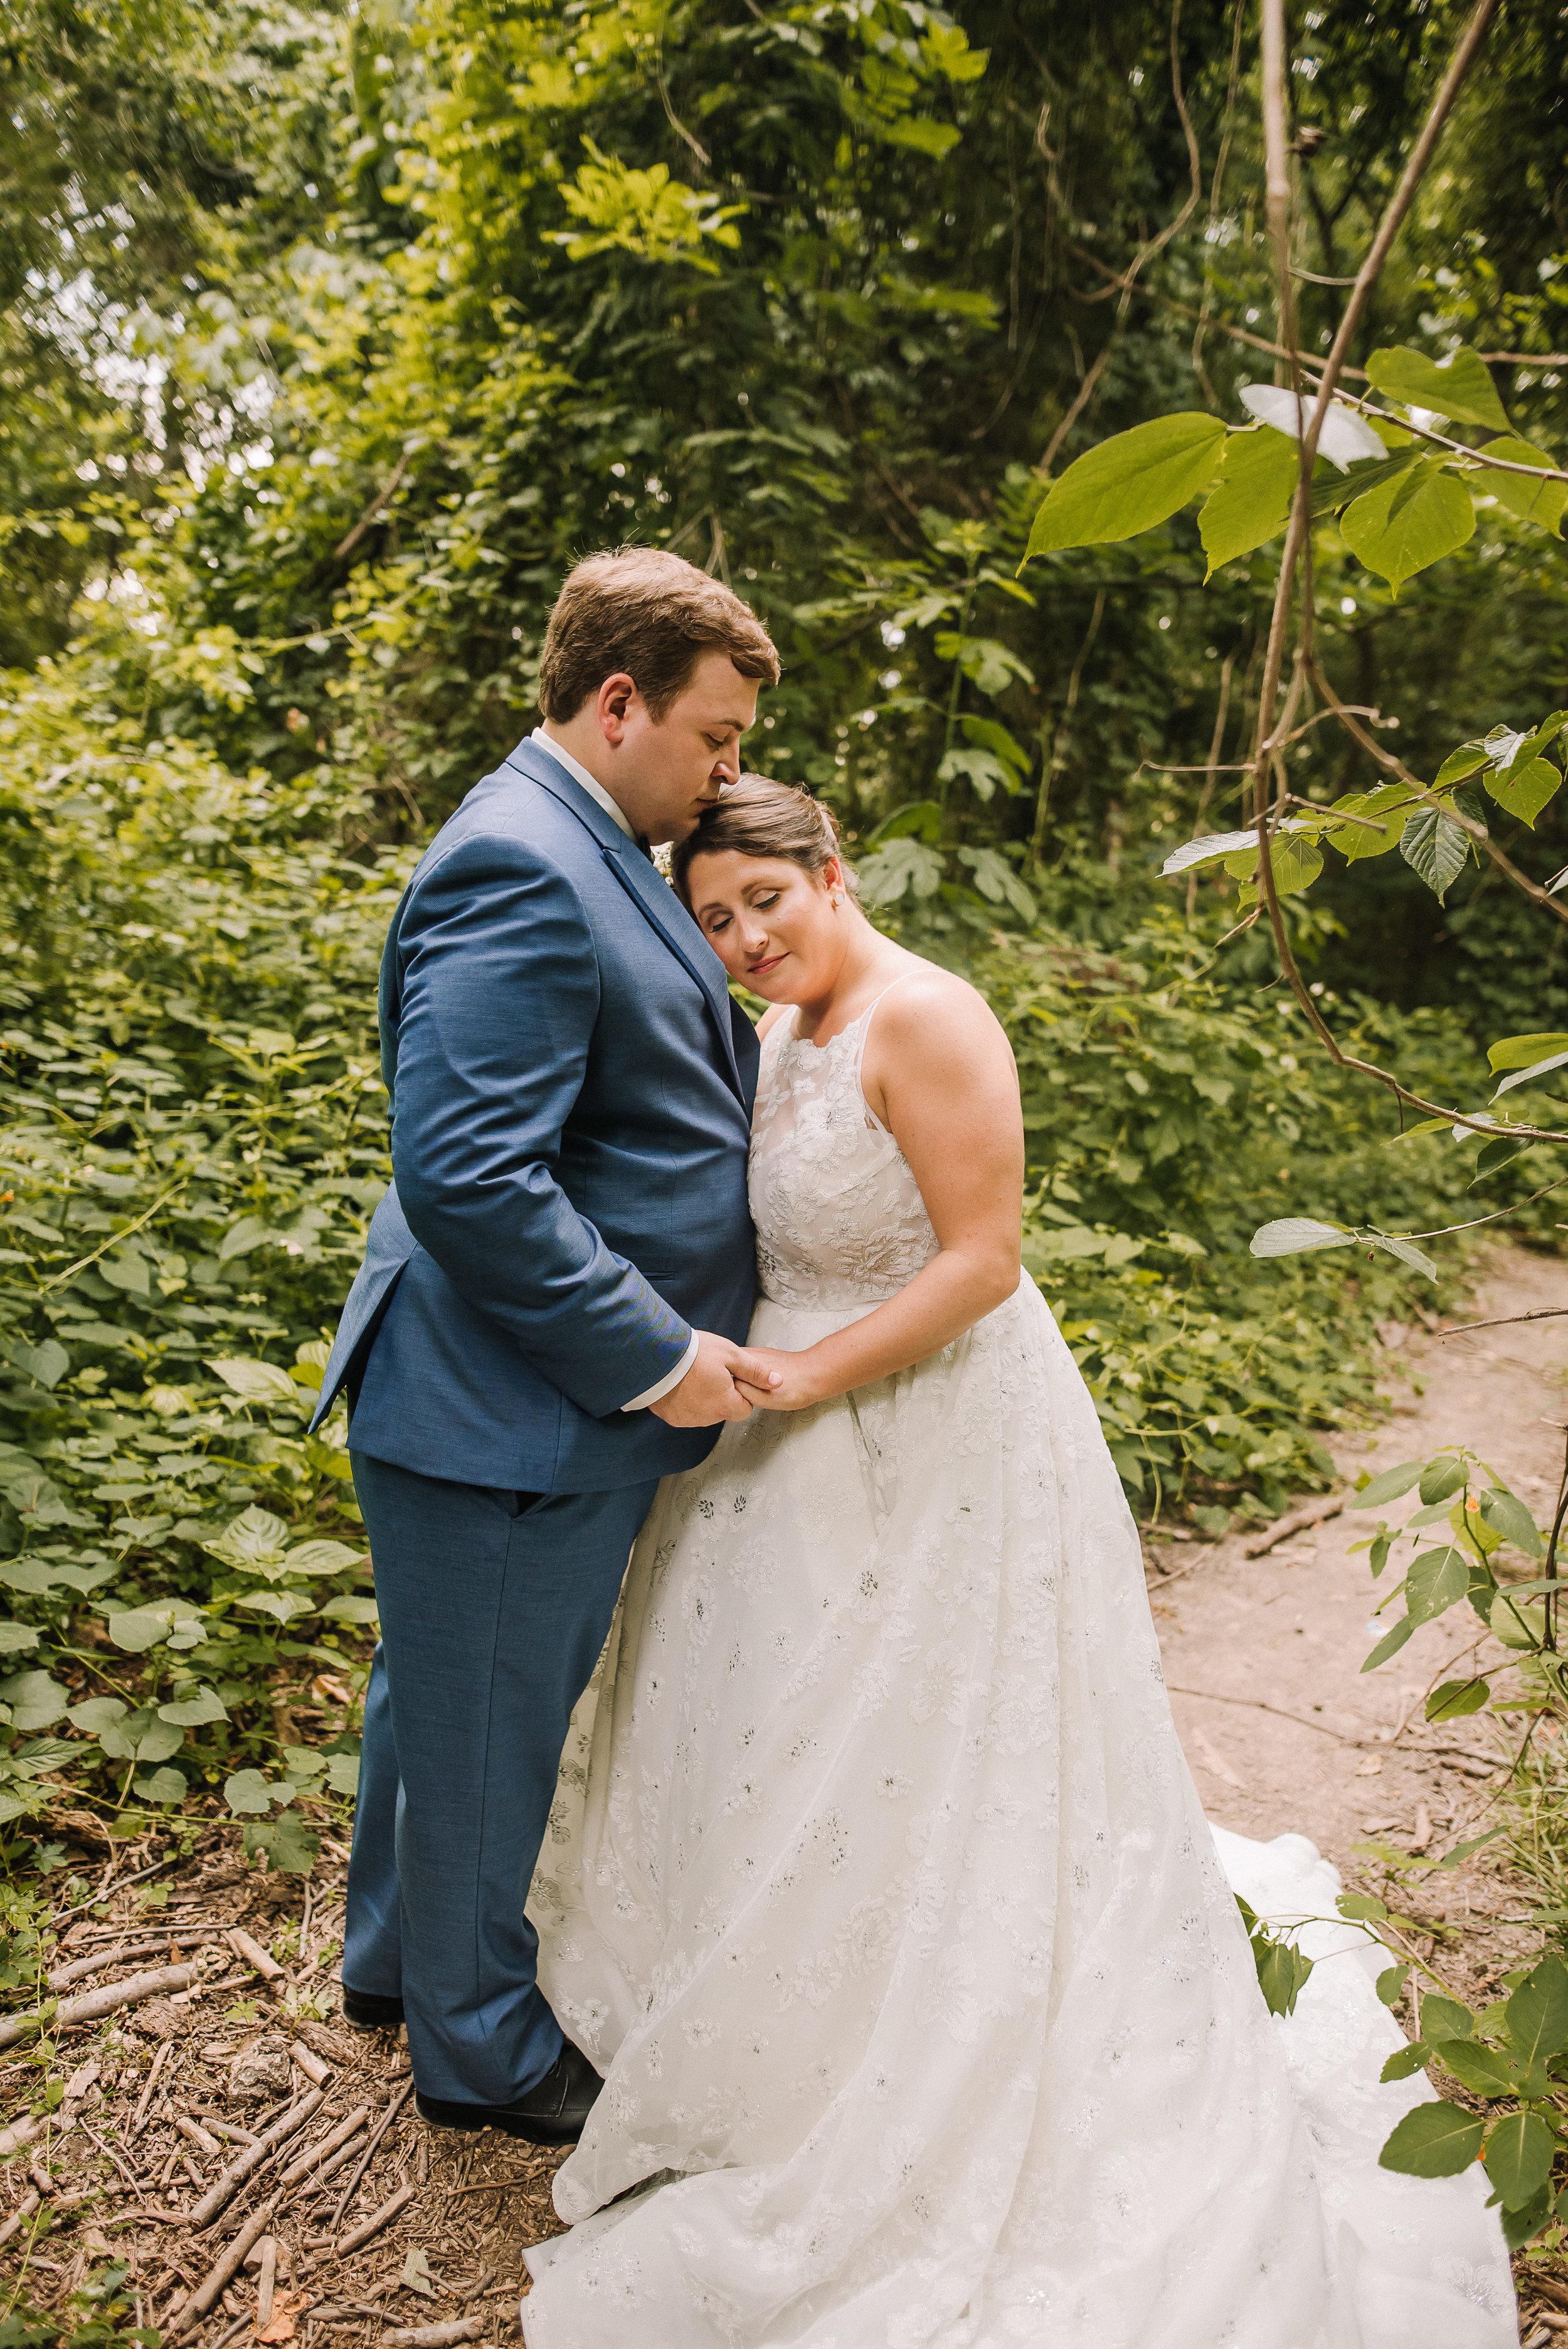 Smith Wedding_Memphis Zoo_Ashley Benham Photography-452.jpg